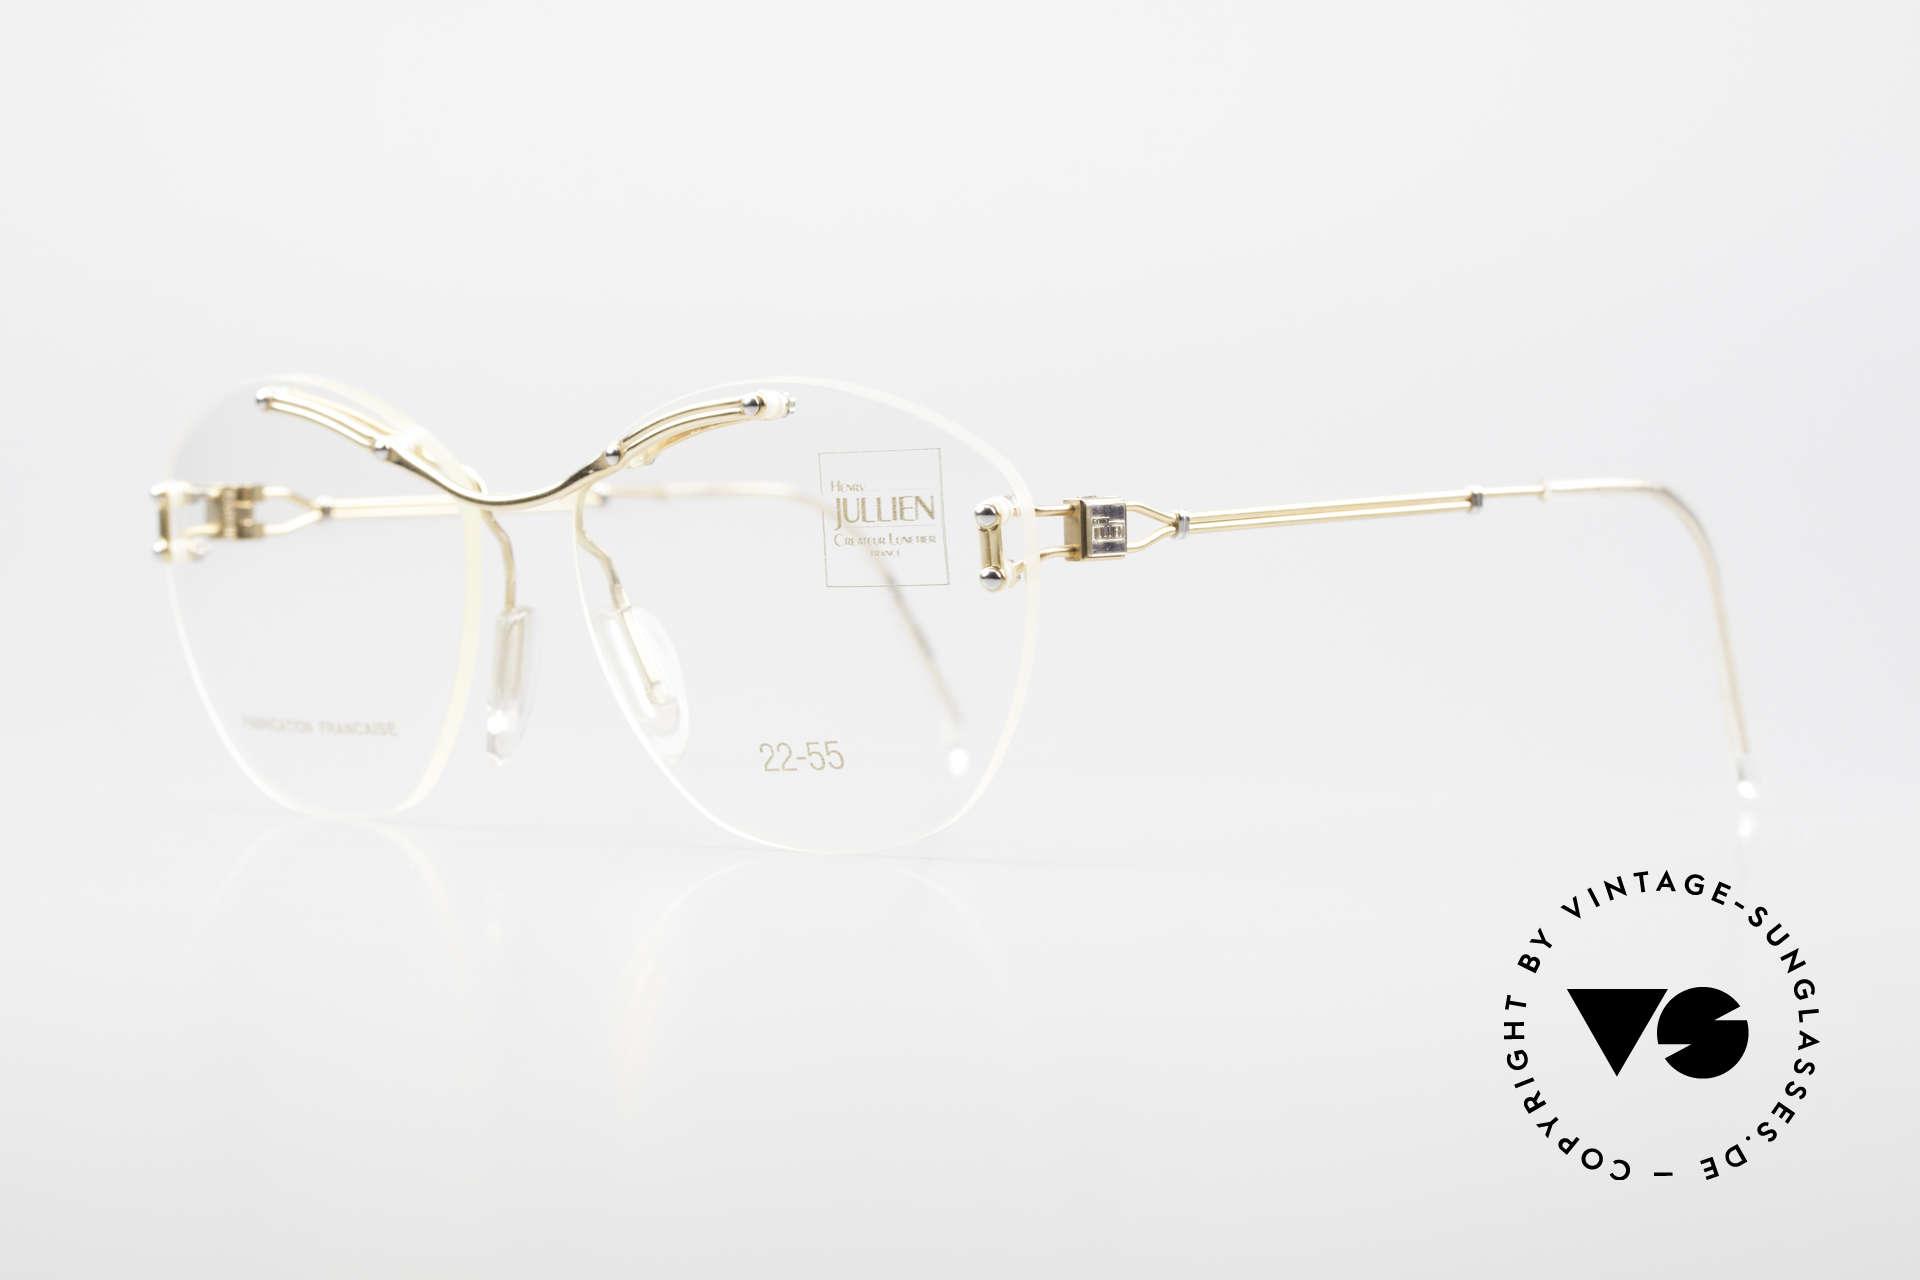 Henry Jullien Melrose 2255 Rimless Vintage Ladies Frame, unworn (like all our rare vintage rimless spectacles), Made for Women